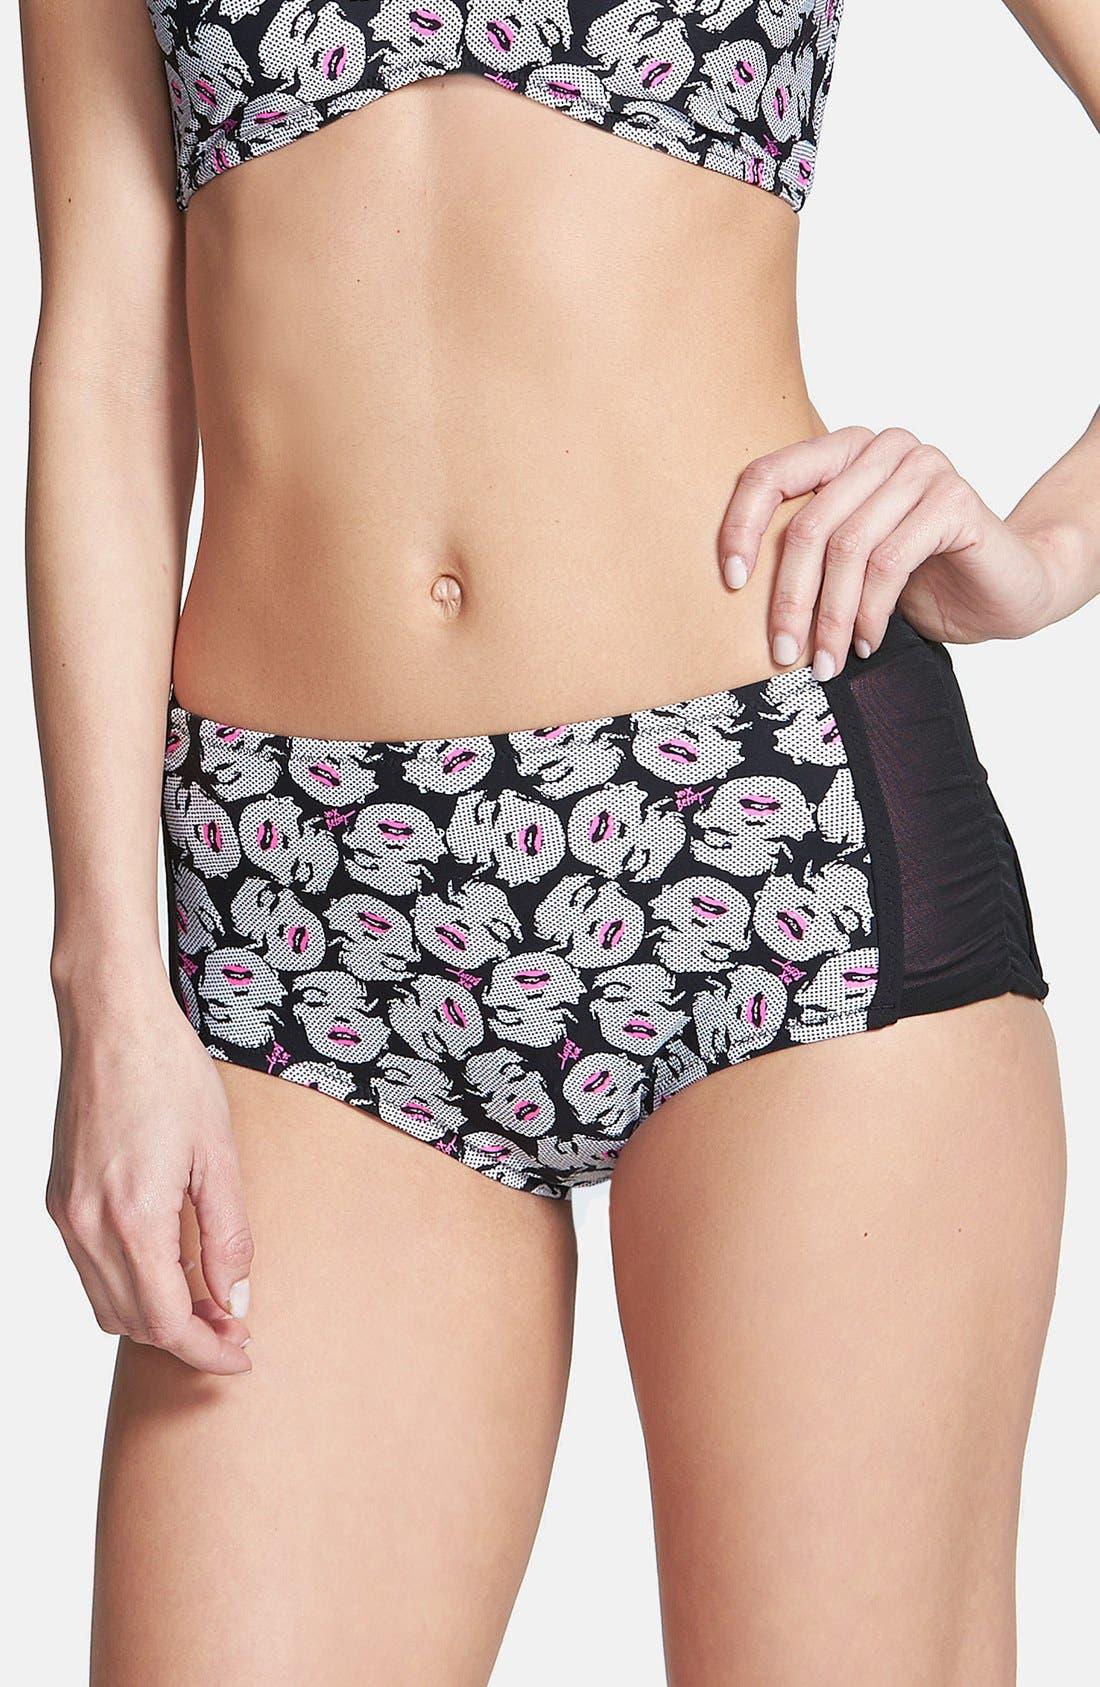 Alternate Image 1 Selected - Betsey Johnson 'Betsey Meets Friend' High Waist Bikini Bottoms